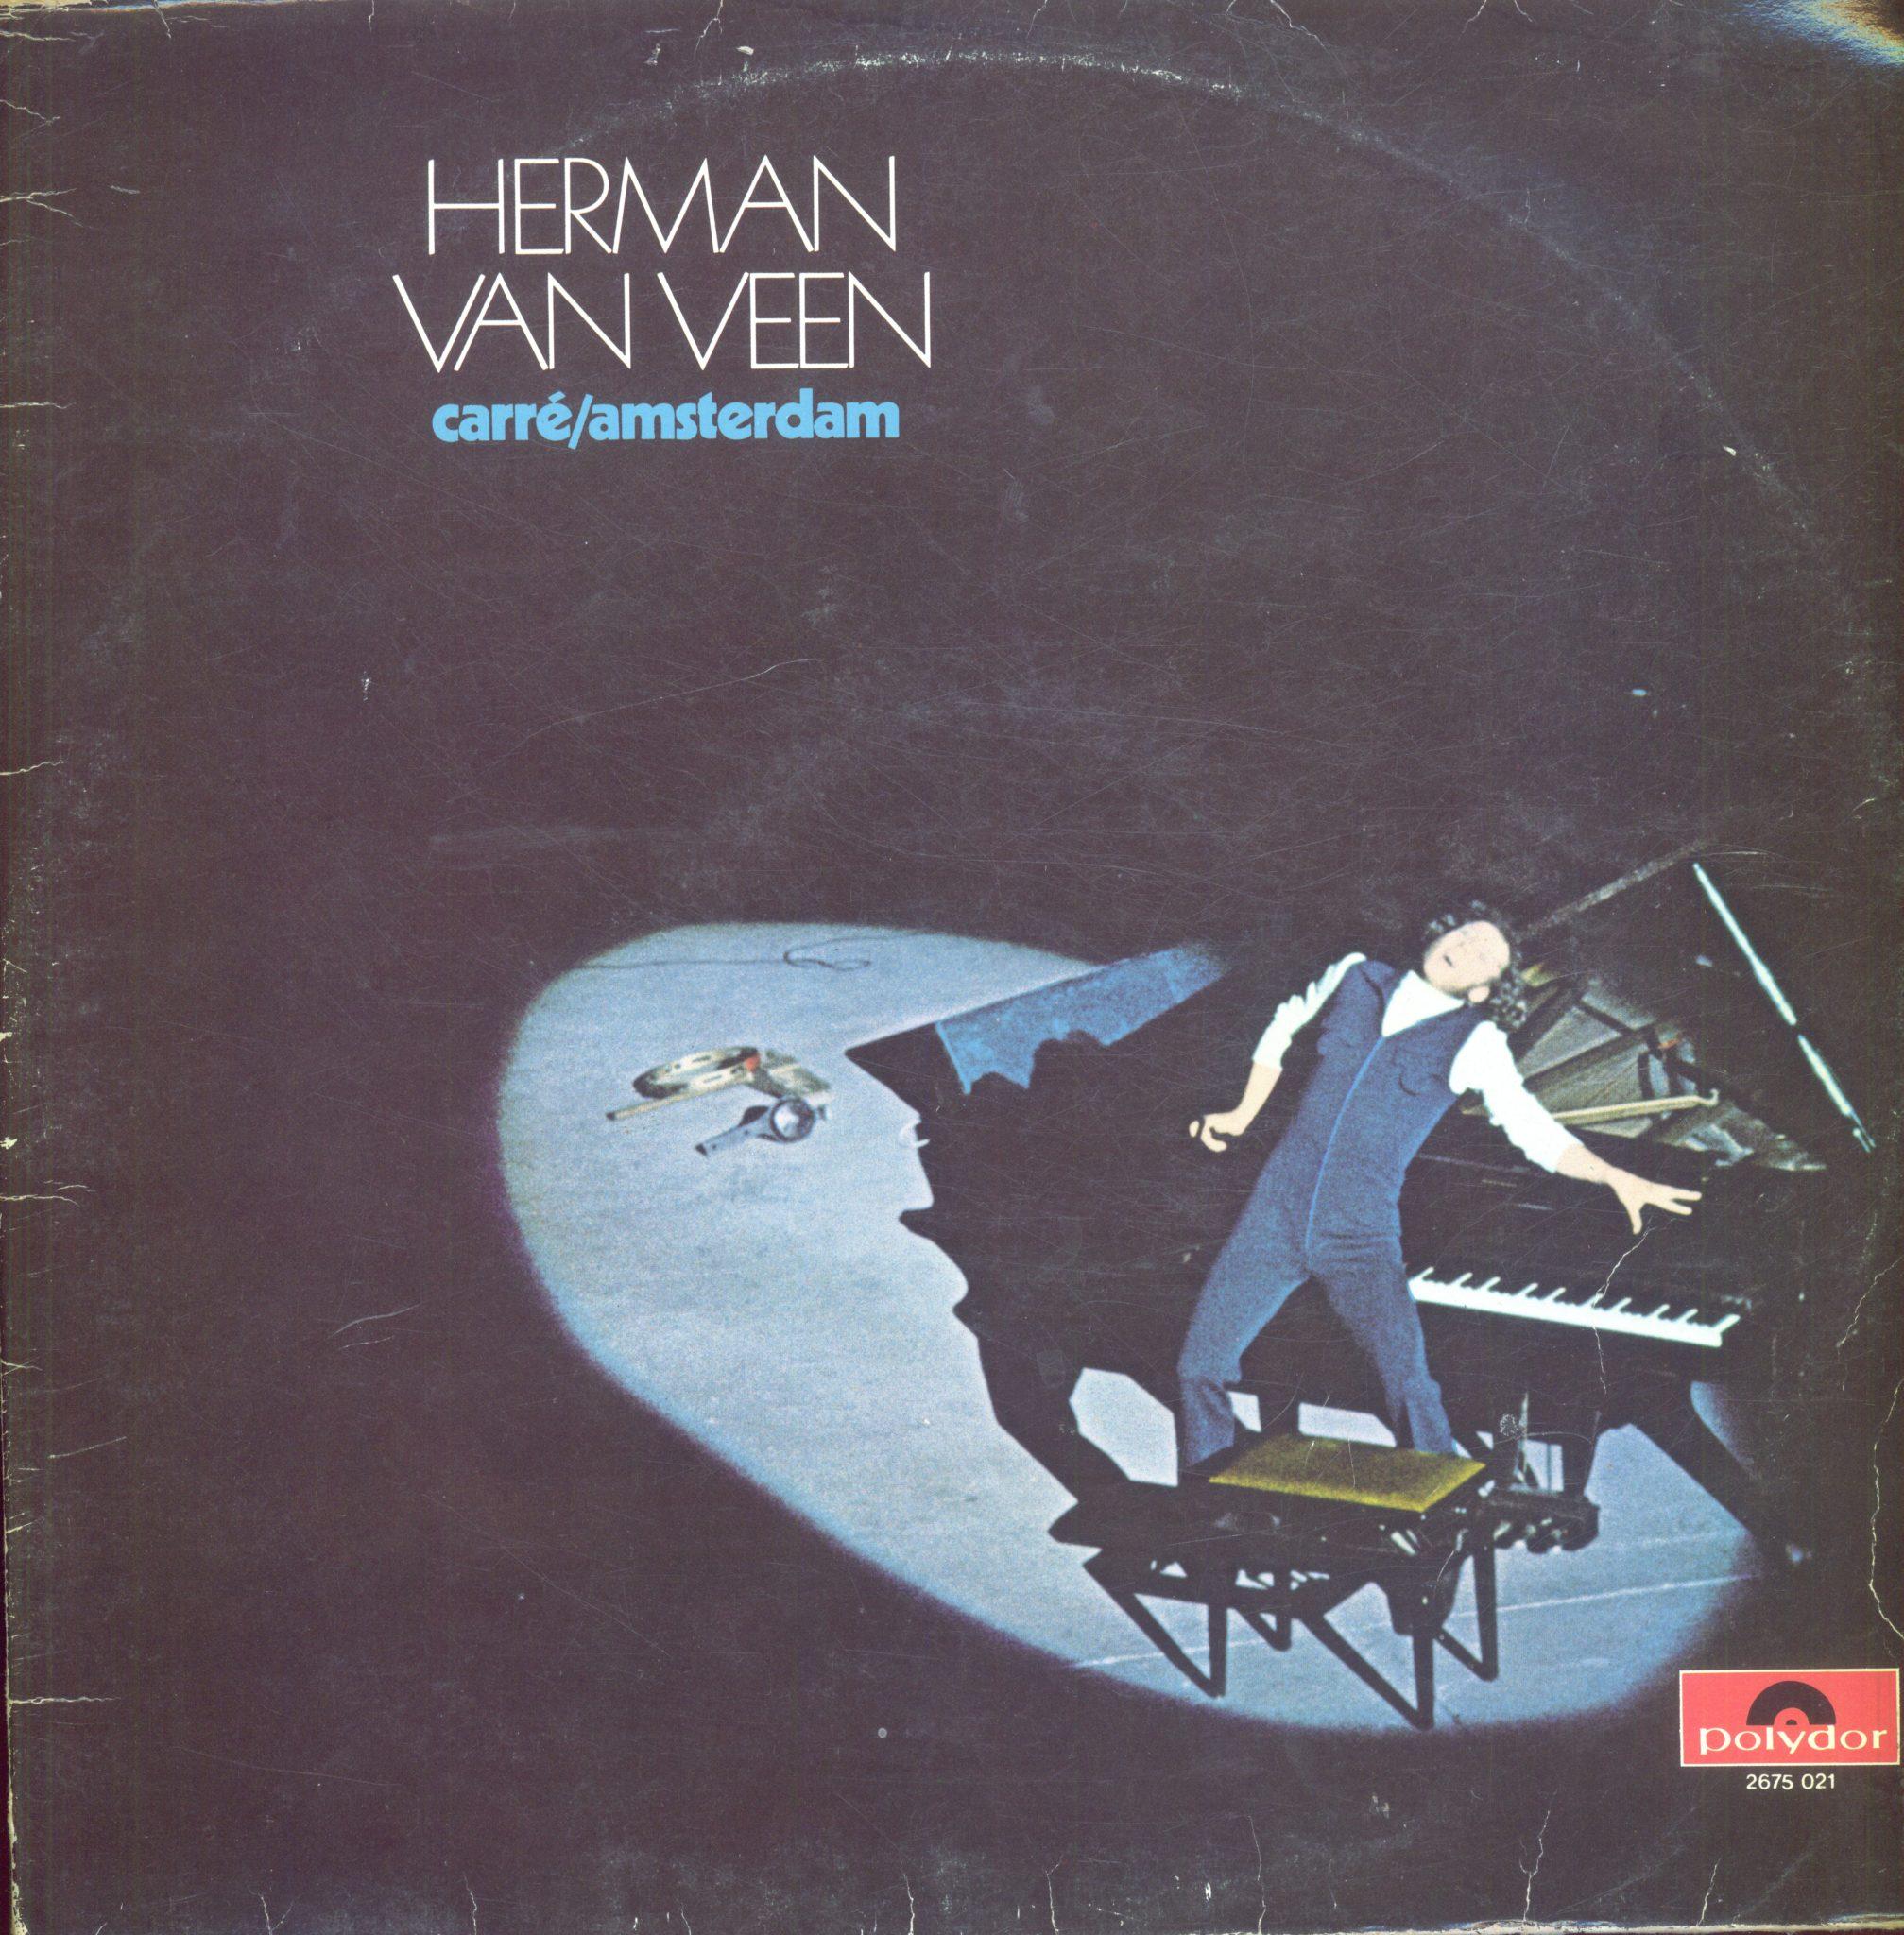 Gramofonska ploča Herman van Veen Carré/Amsterdam 2675 021